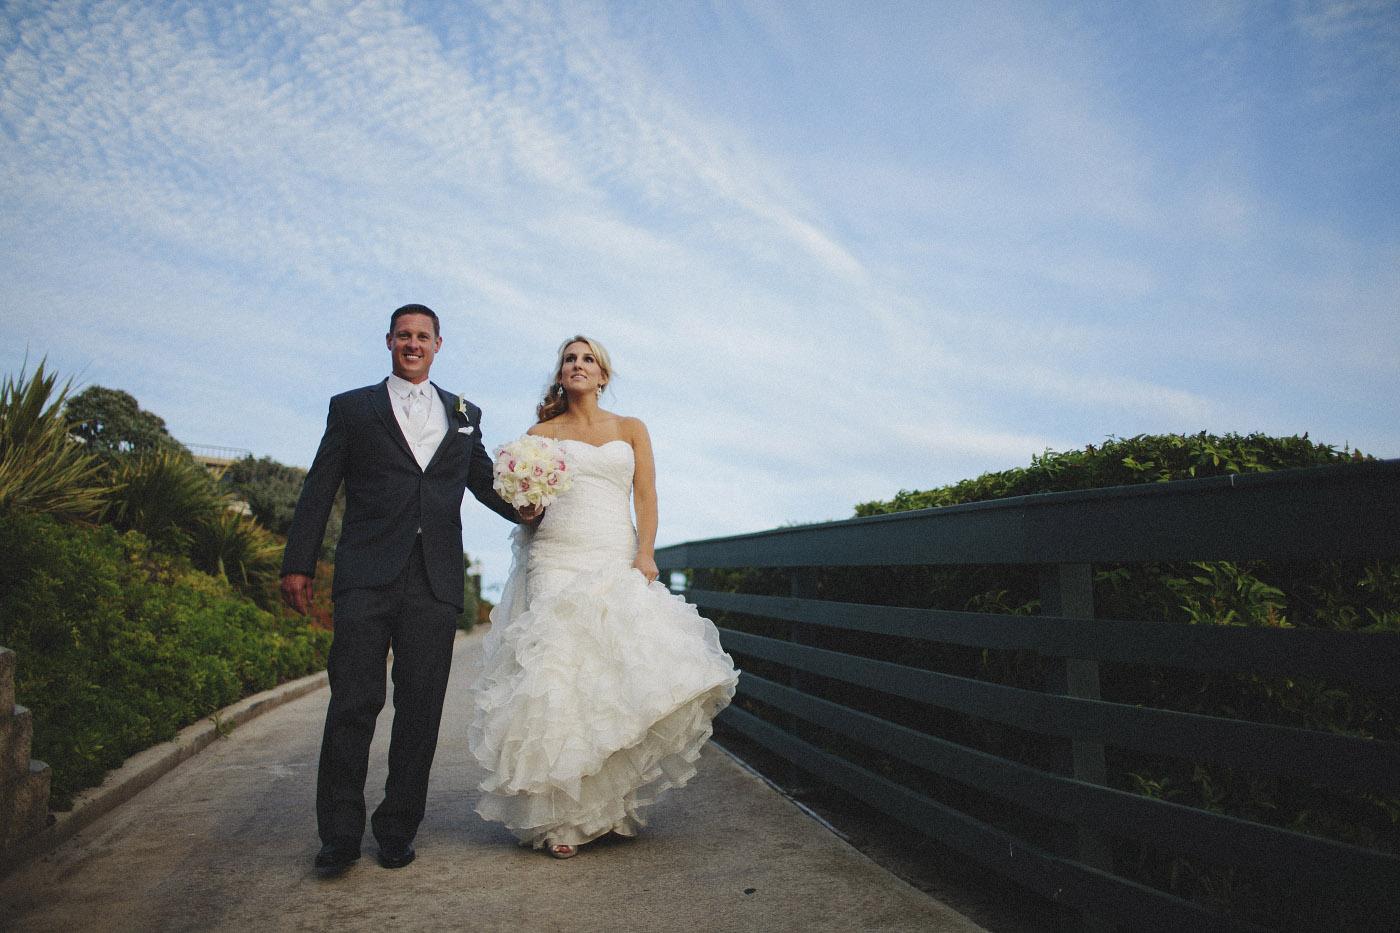 St Regis Monarch Beach51.jpg